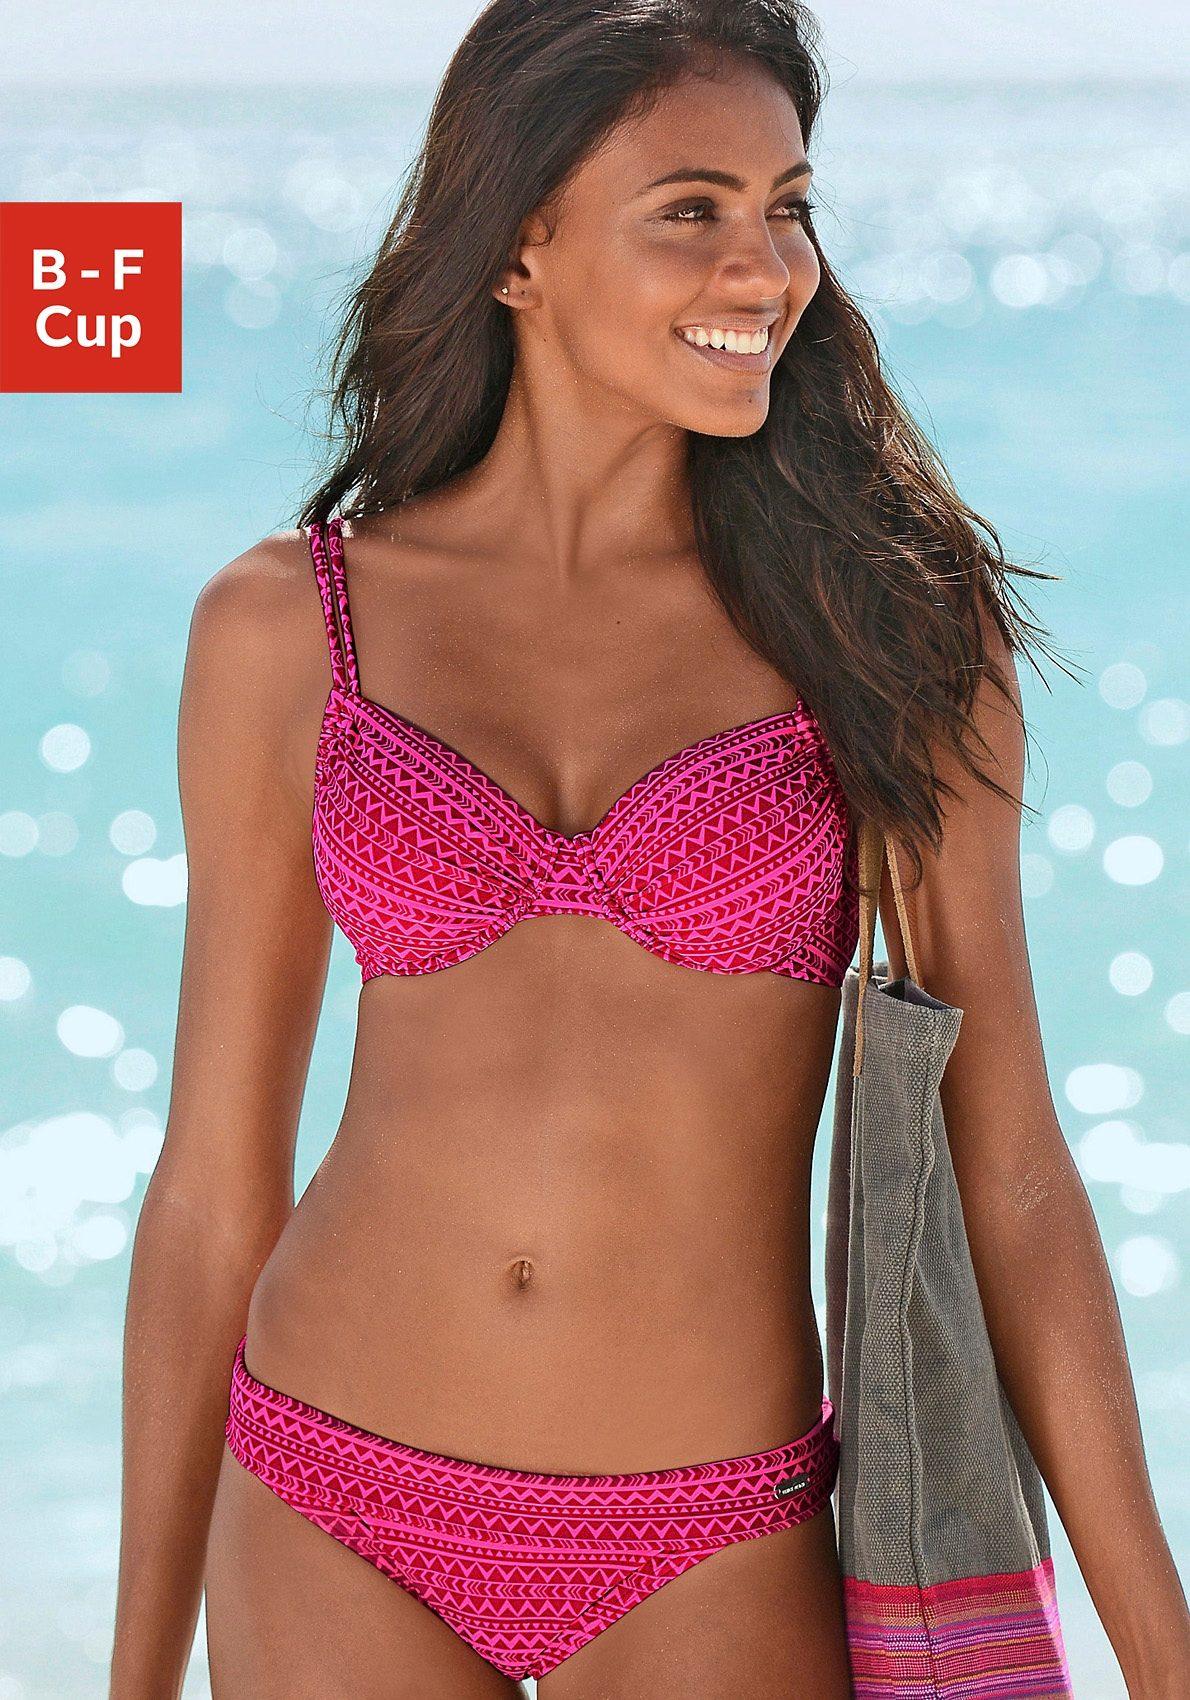 Venice Beach Bügel-Top »Ethno« in angesagten Farben